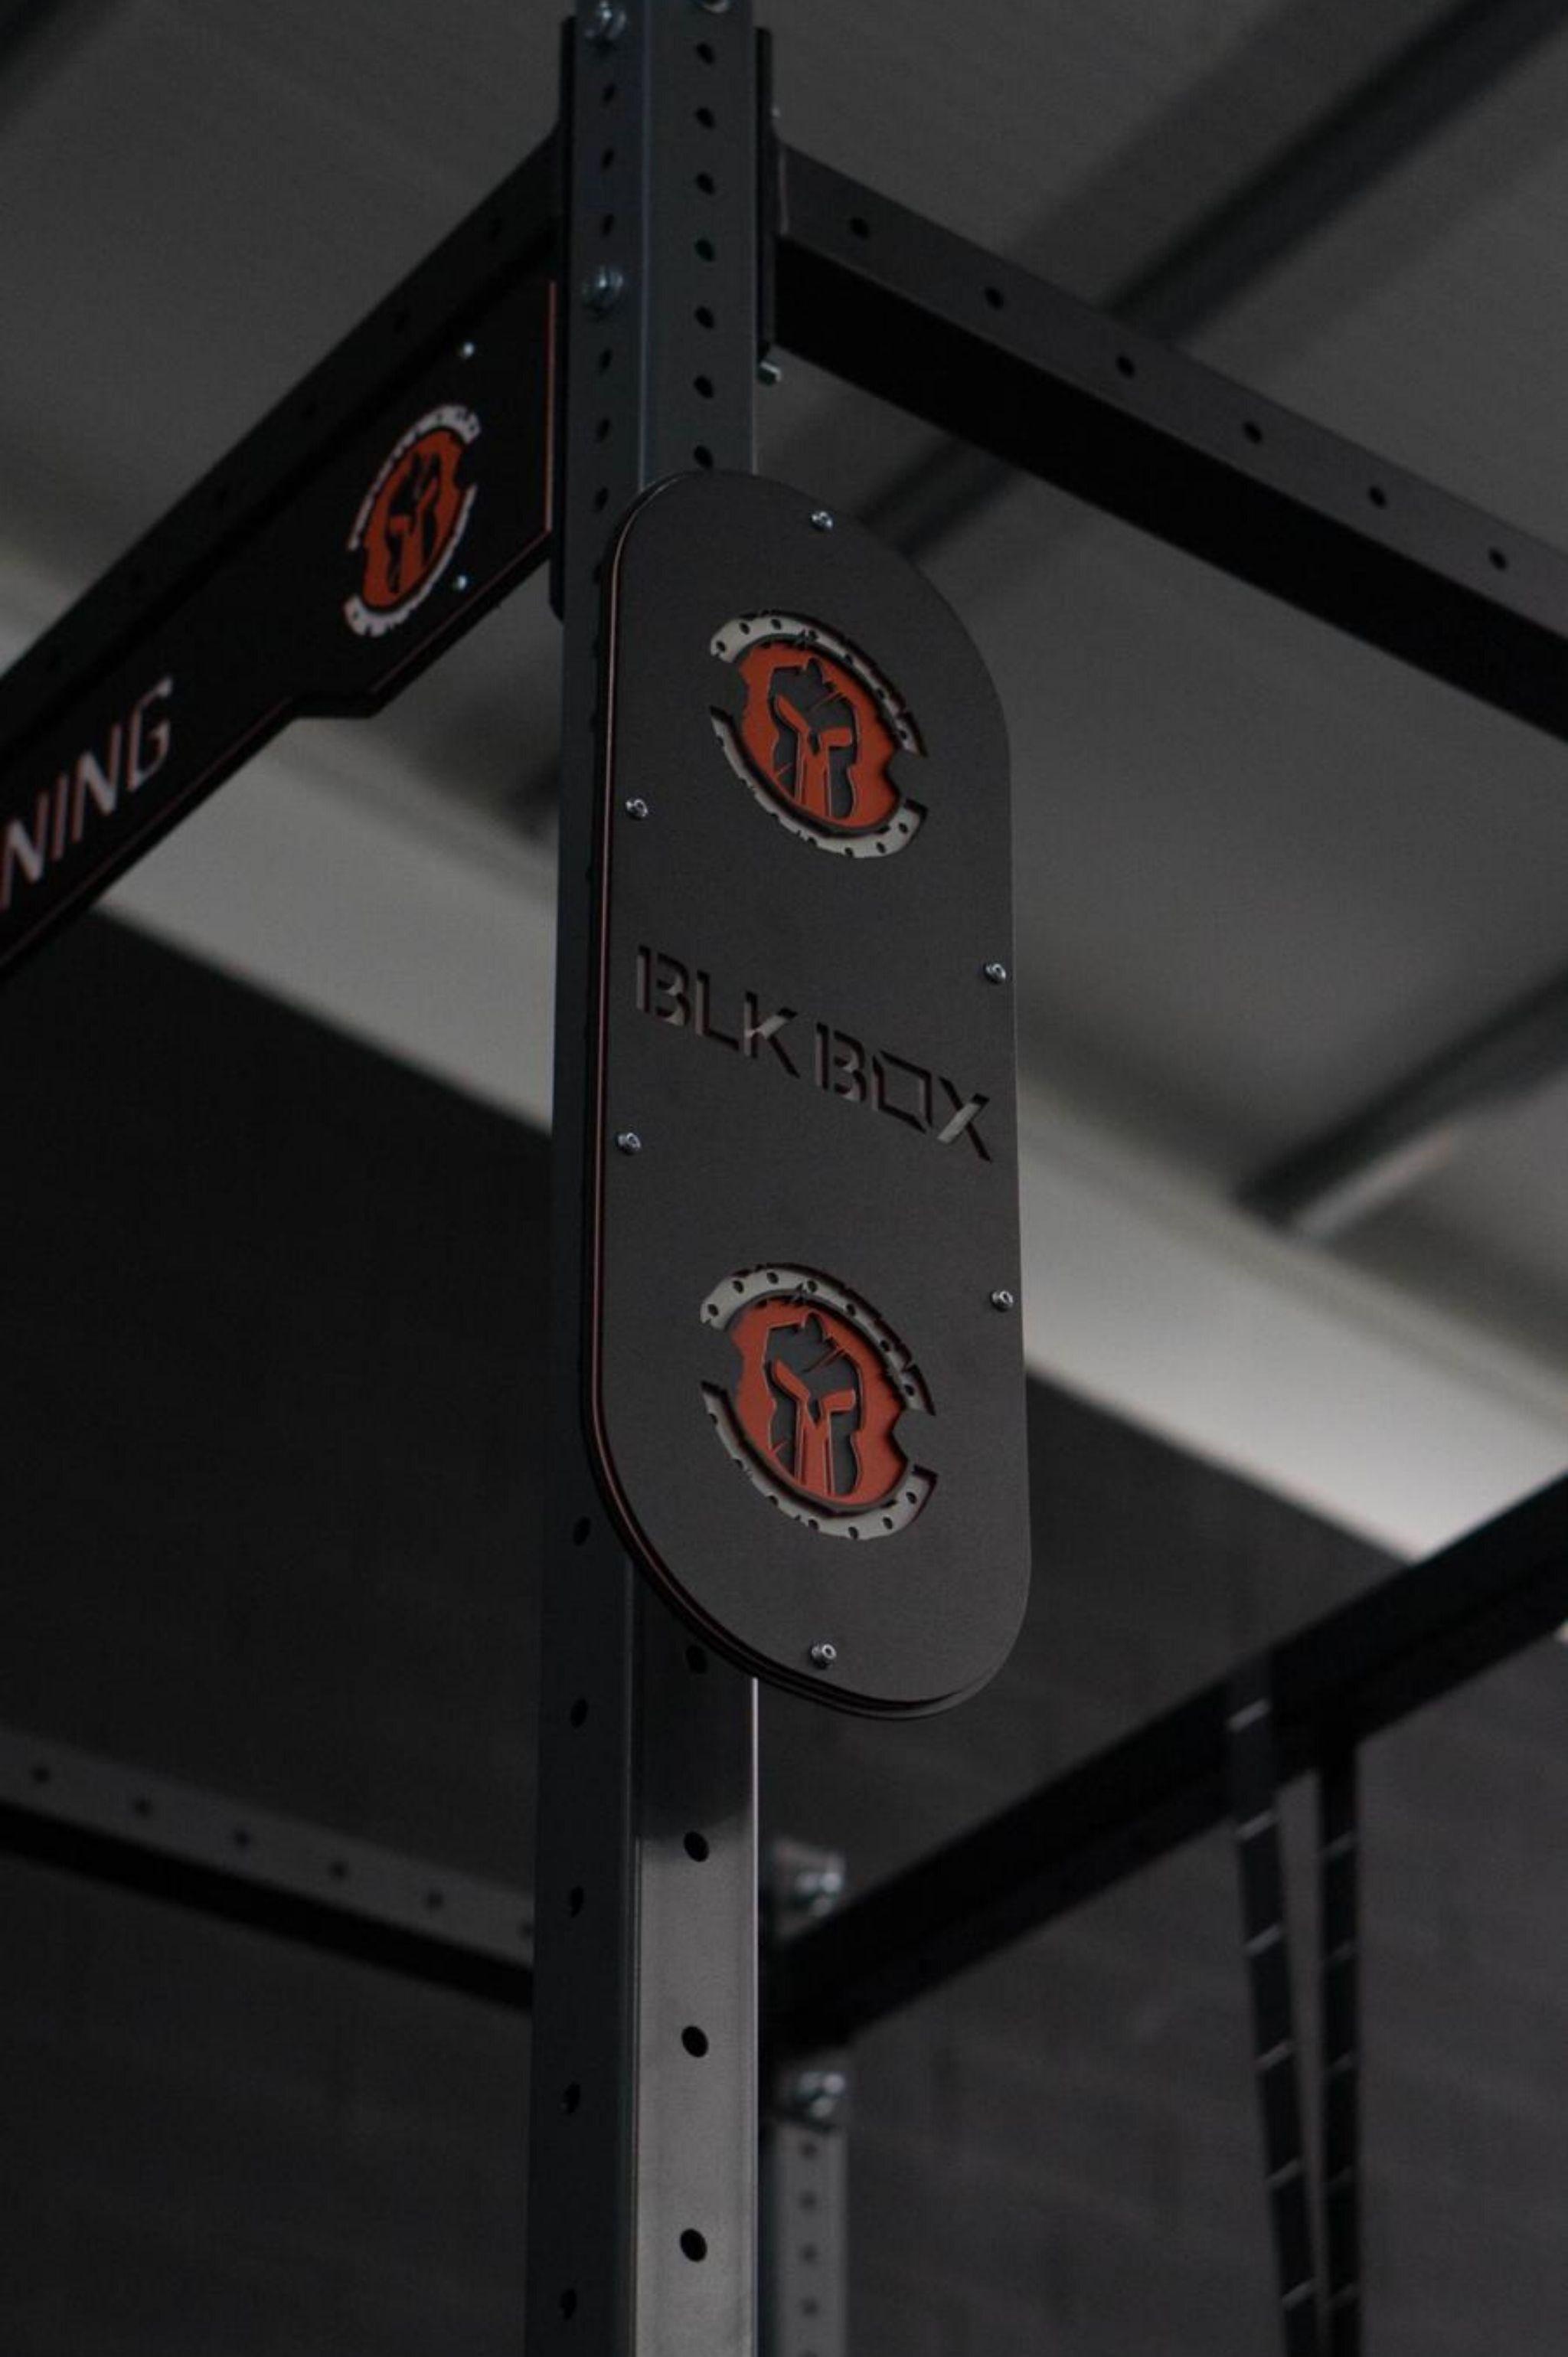 gladiator gym equipment